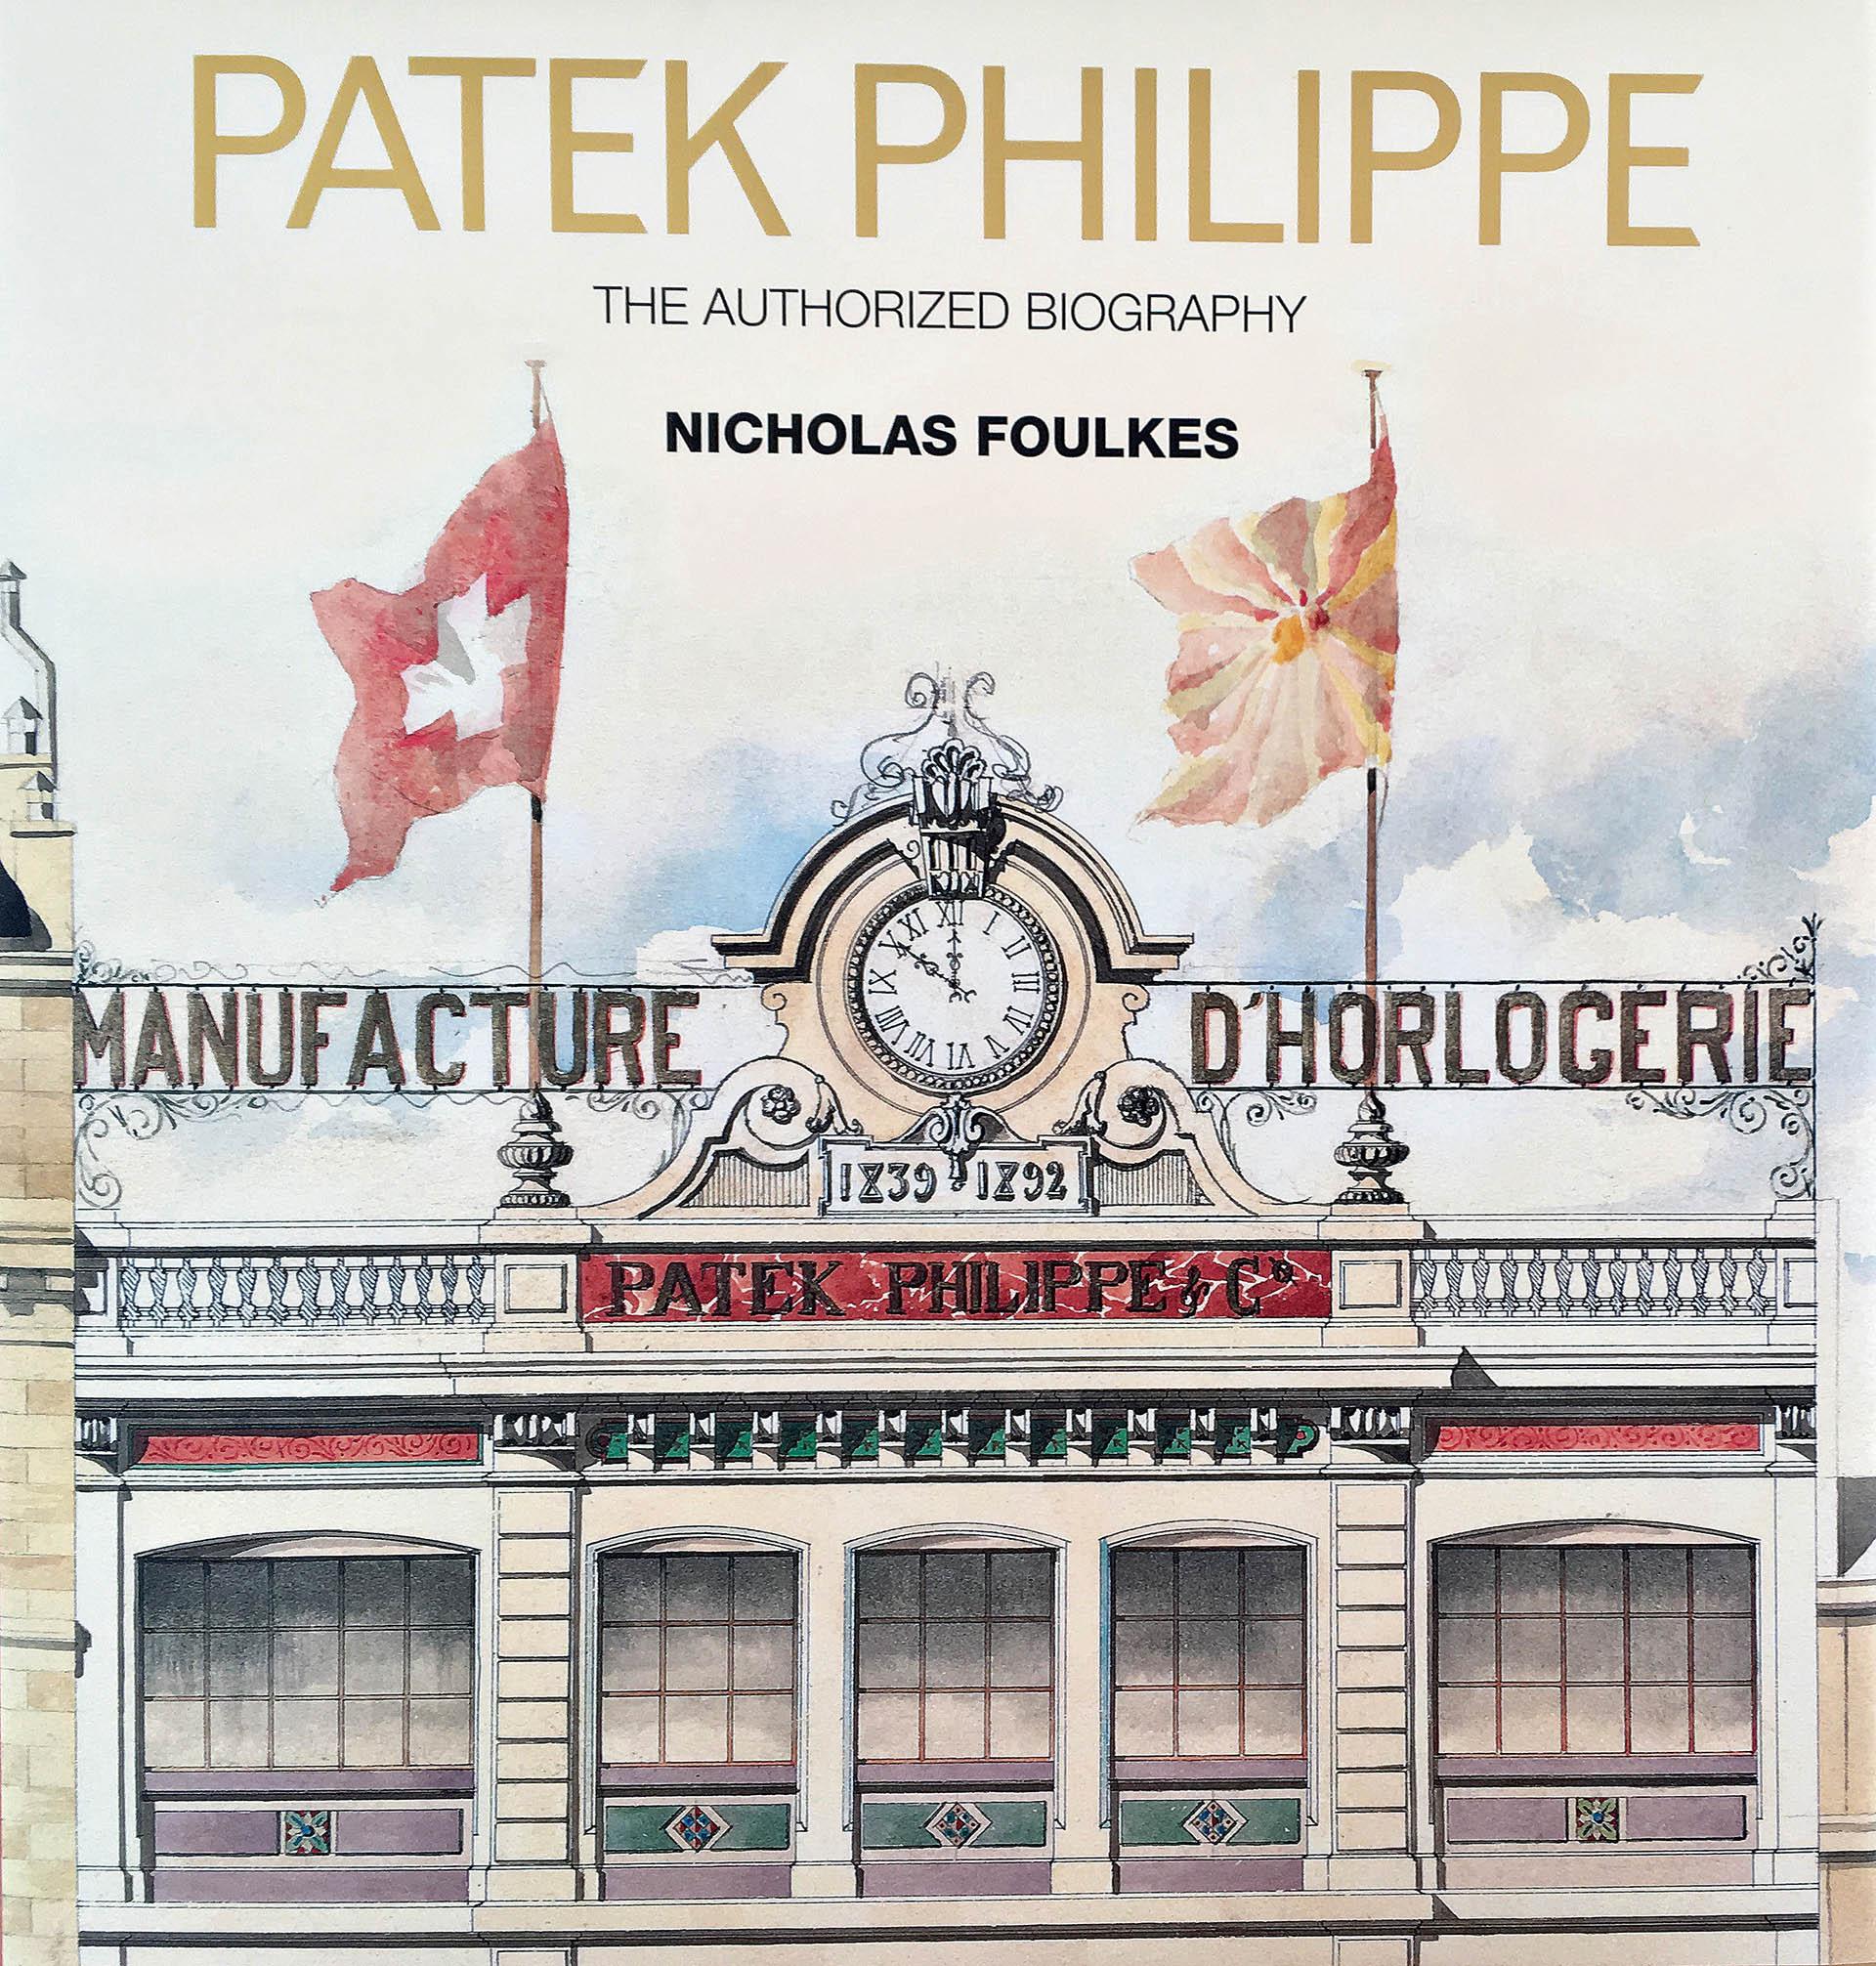 Patek Philippe Biography